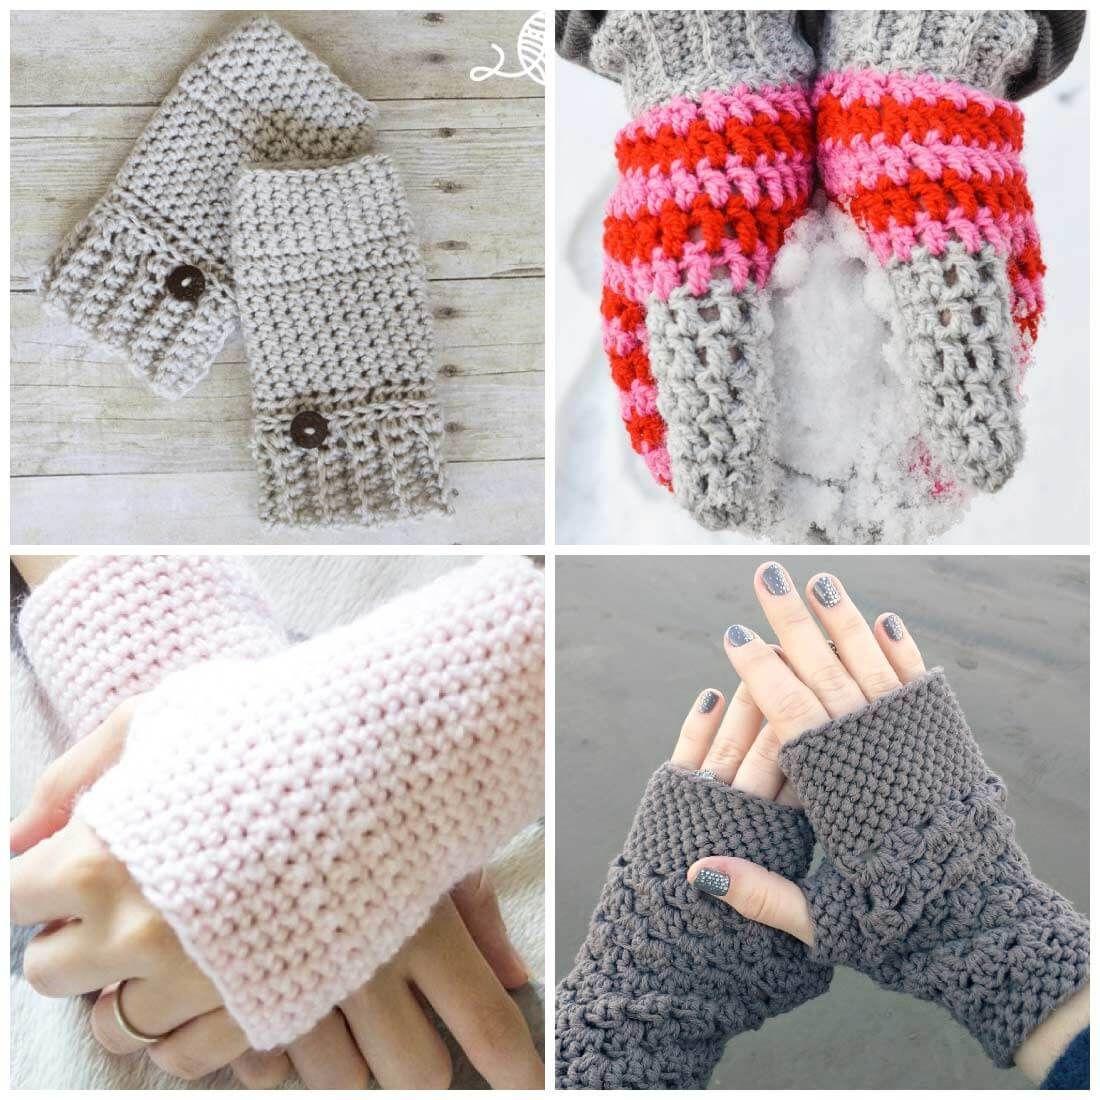 Crochet fingerless gloves mitten crochet patterns fingerless crochet fingerless gloves mitten crochet patterns bankloansurffo Images